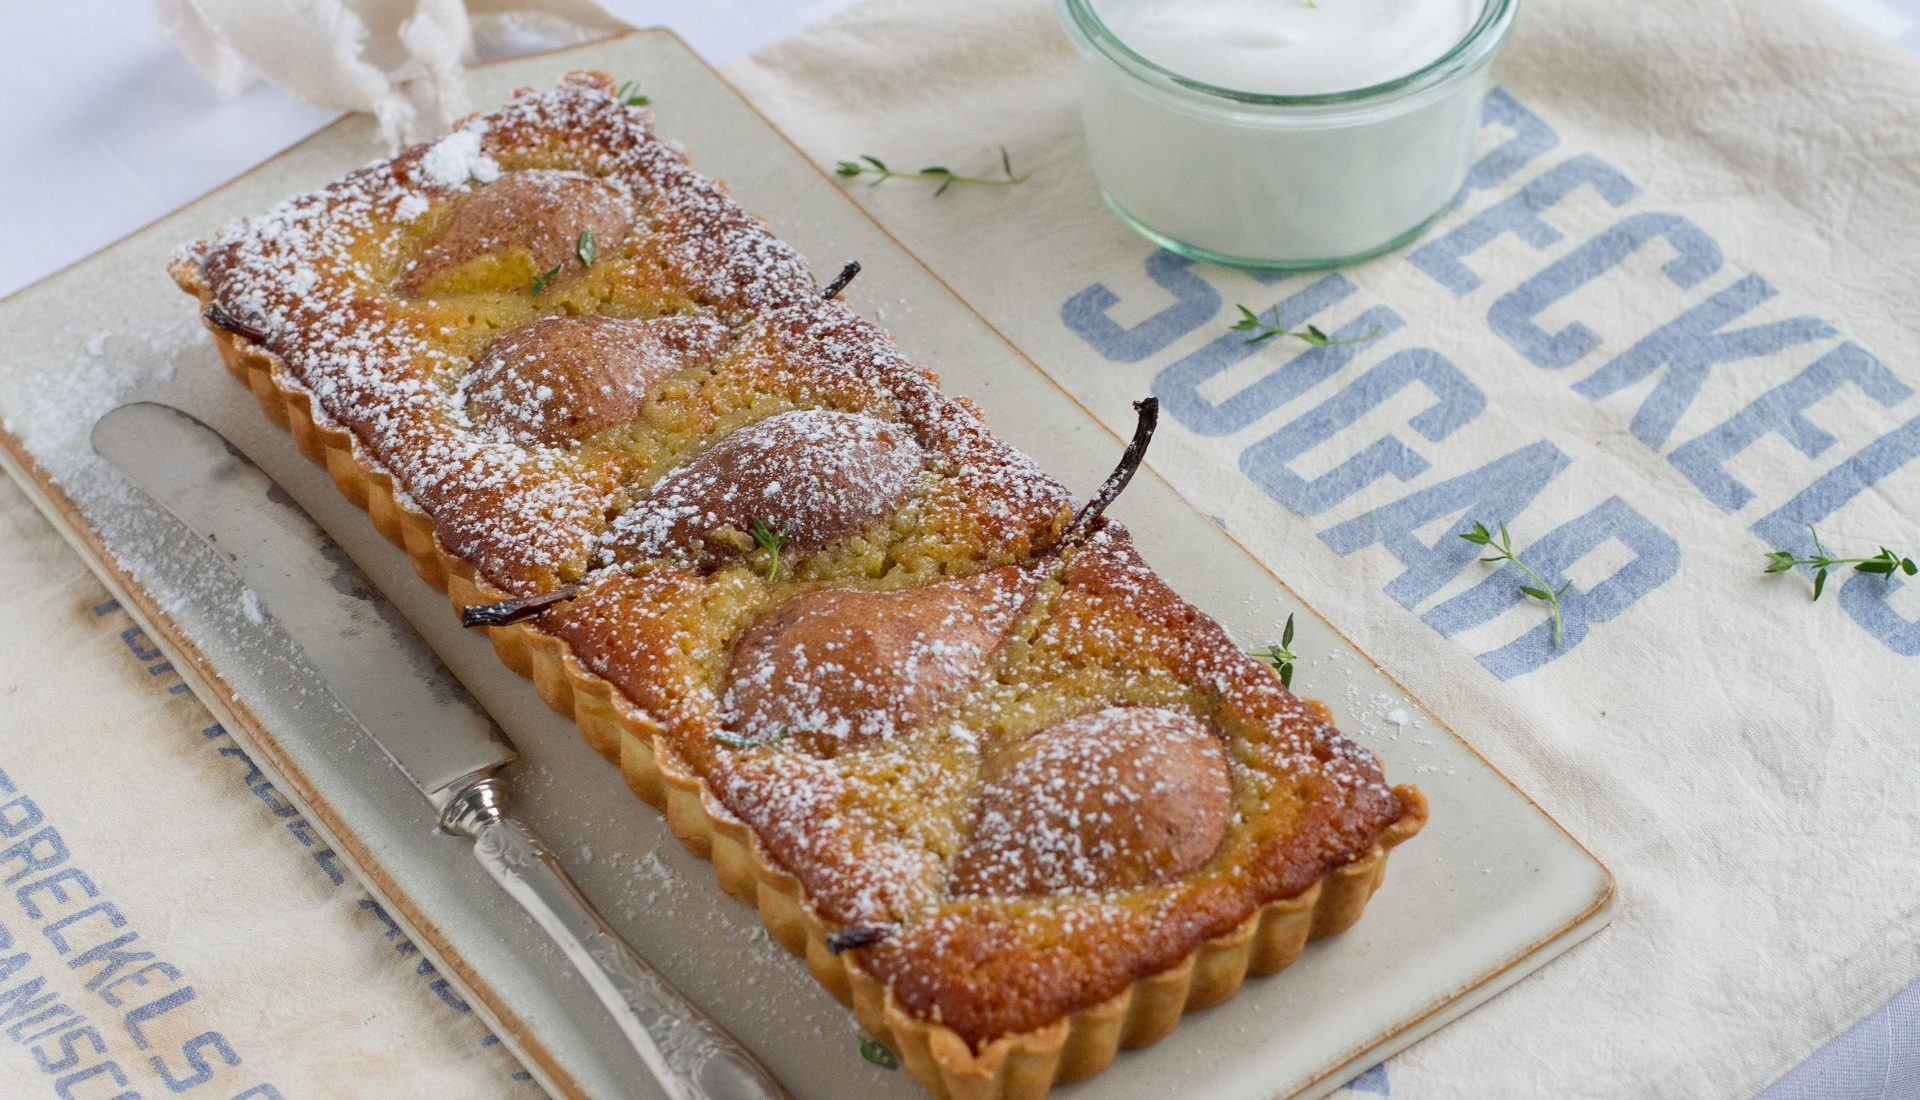 Torta cremosa de amêndoa com pera e tomilho